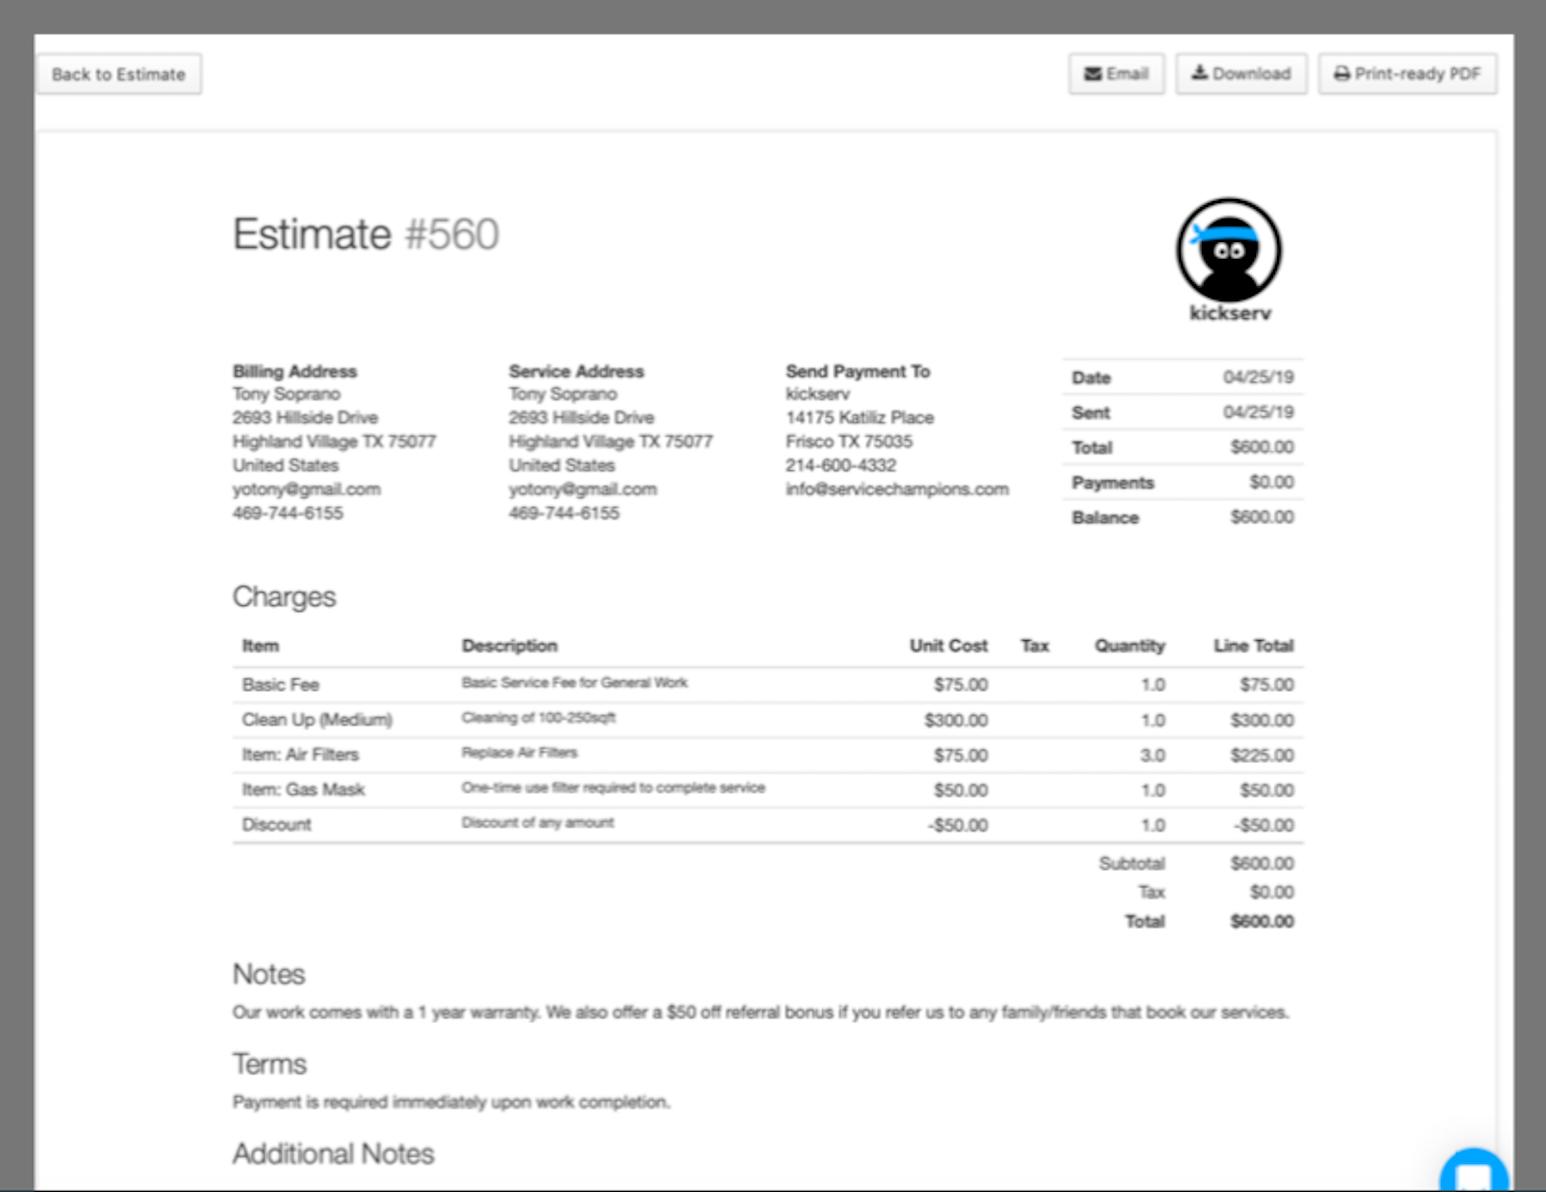 Kickserv Software - 3